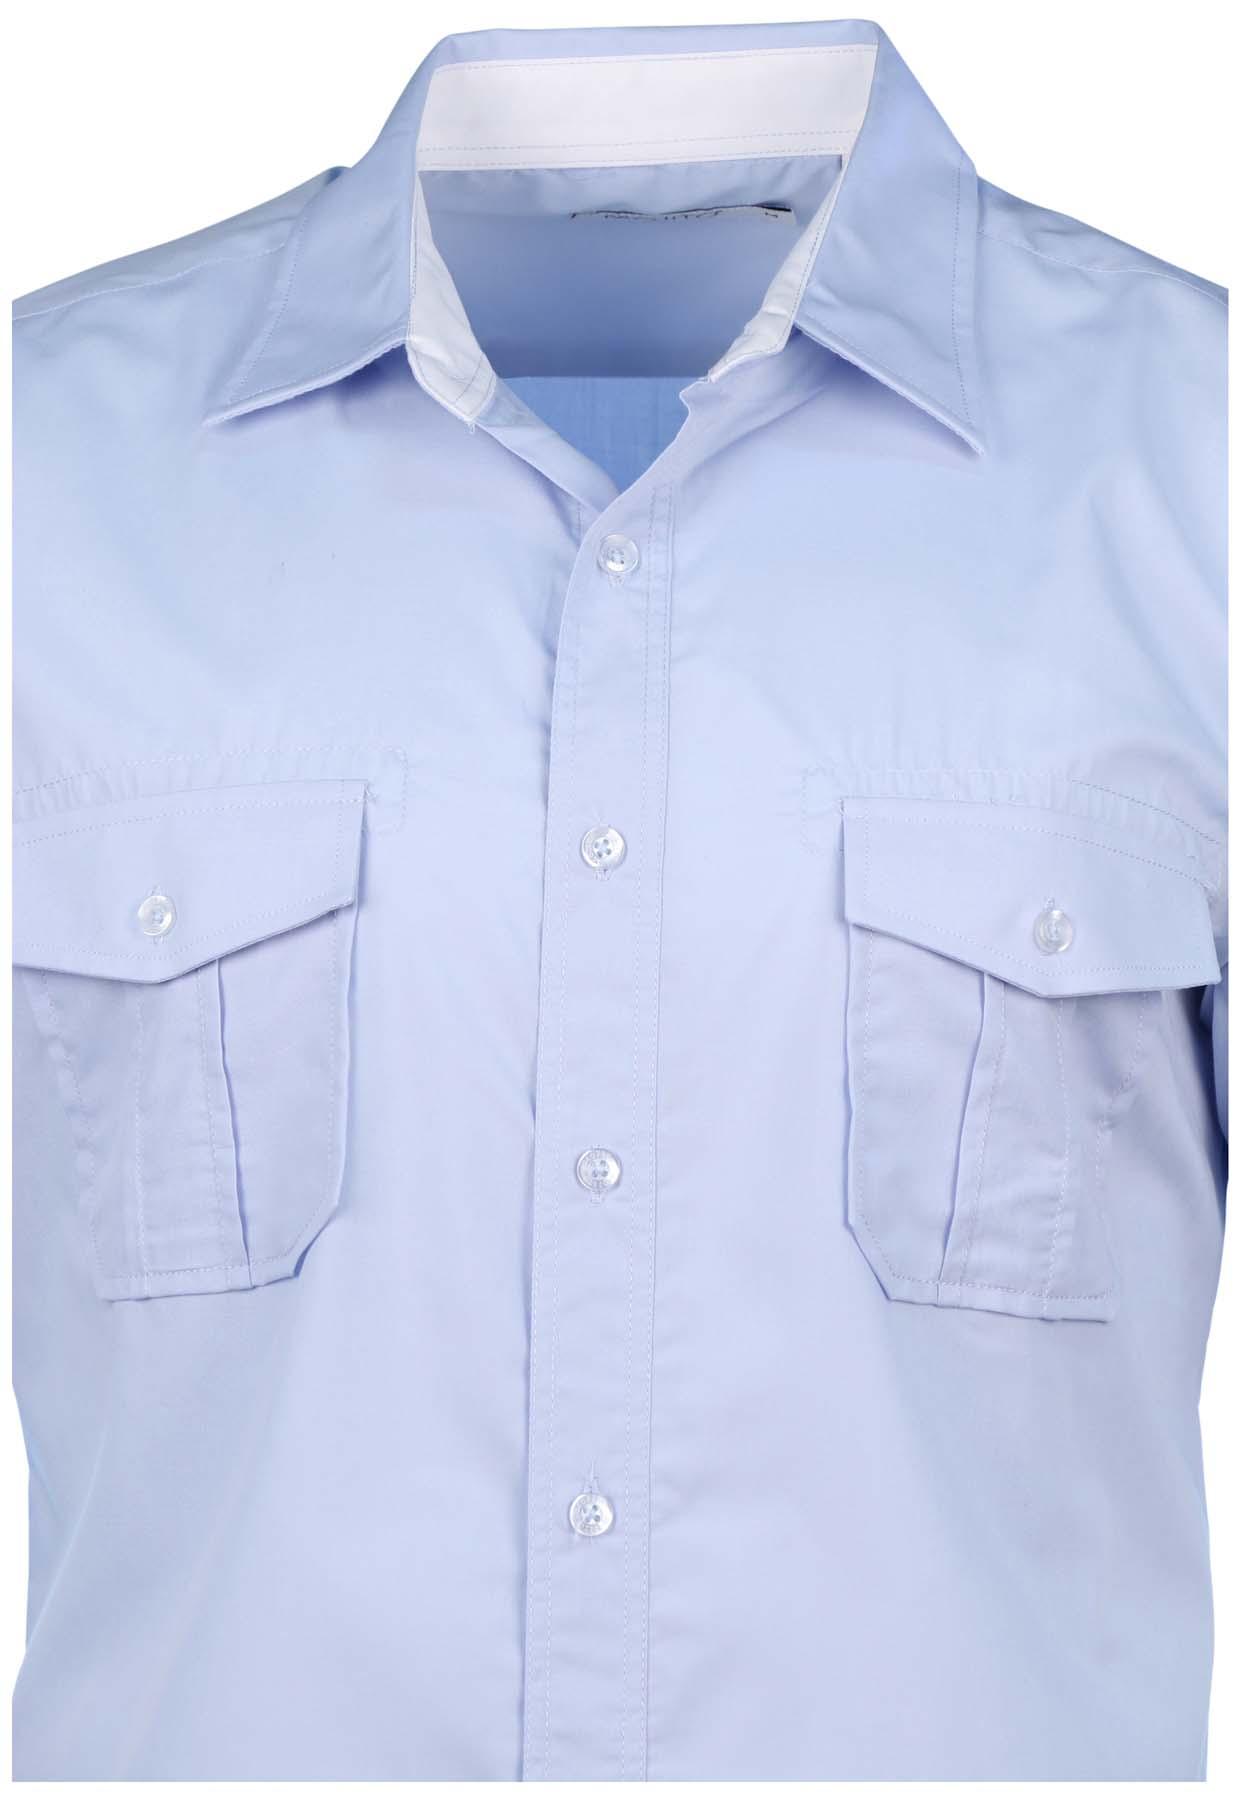 Mojito Collection Men 39 S 2 Pocket Short Sleeve Button Down